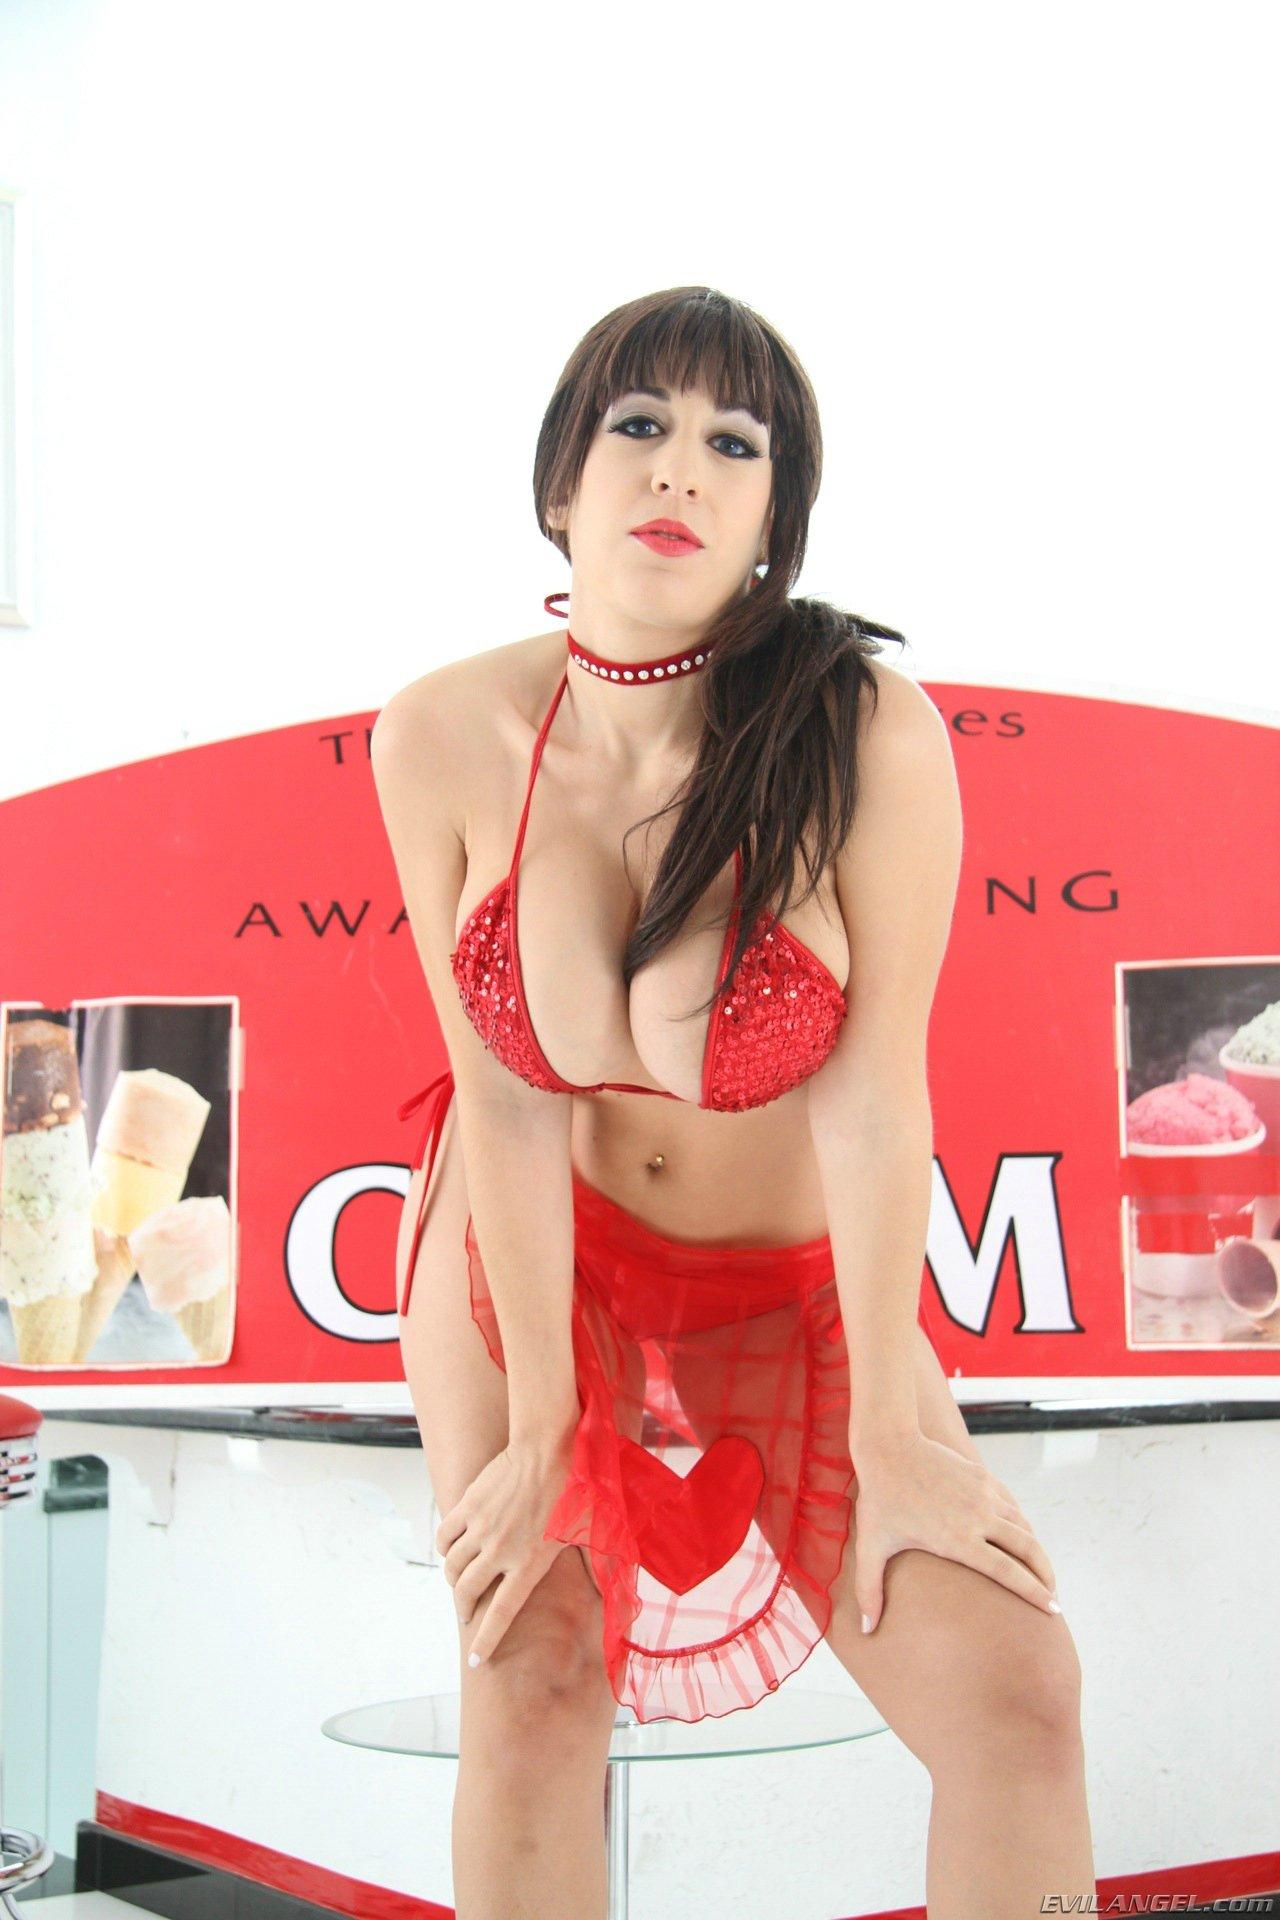 Ann angel masturbating